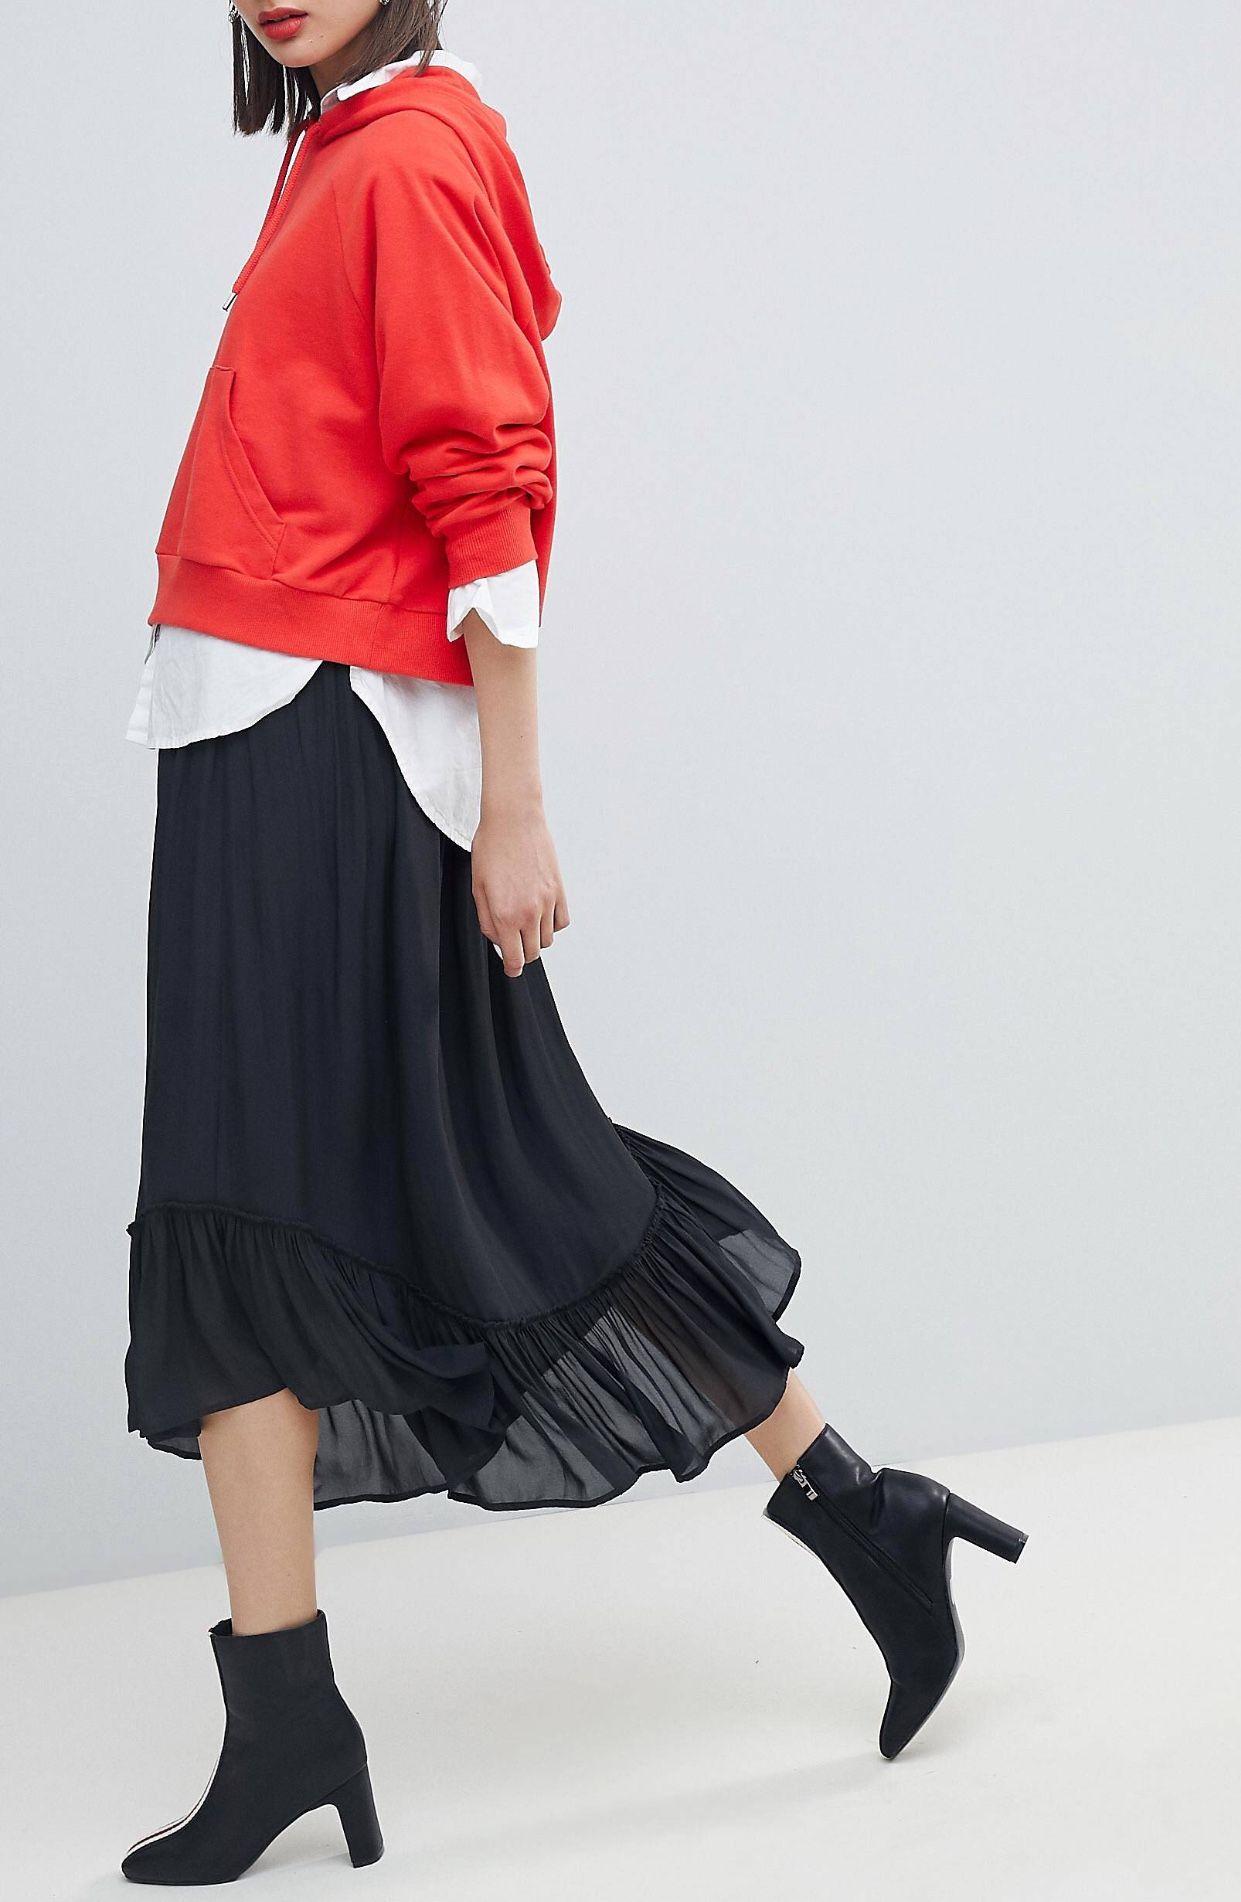 Ladies Wet Look Shiny Pvc Frill Hem Pencil Midi Skirt Black